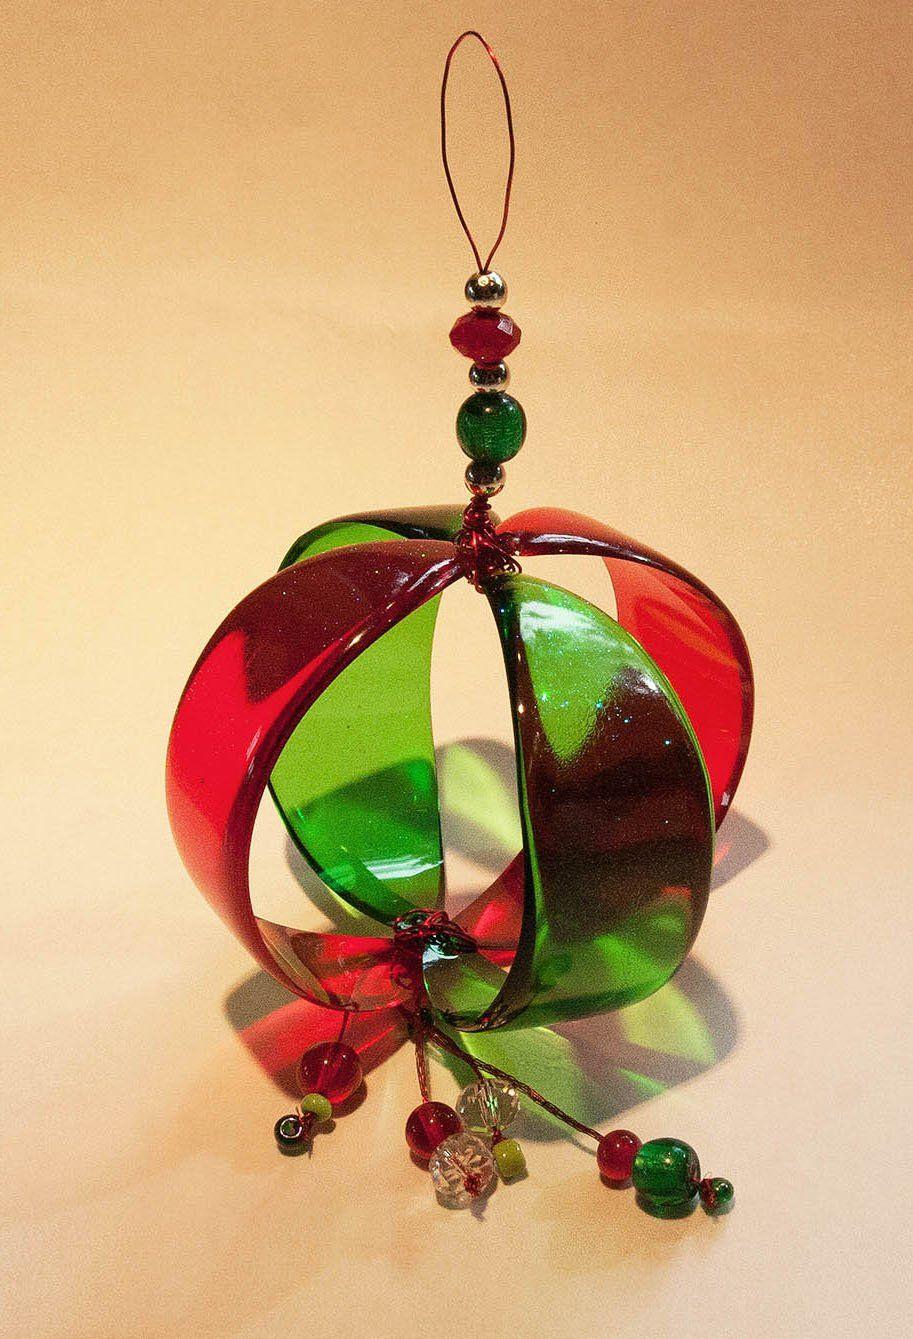 Bendy resin ornaments avec images